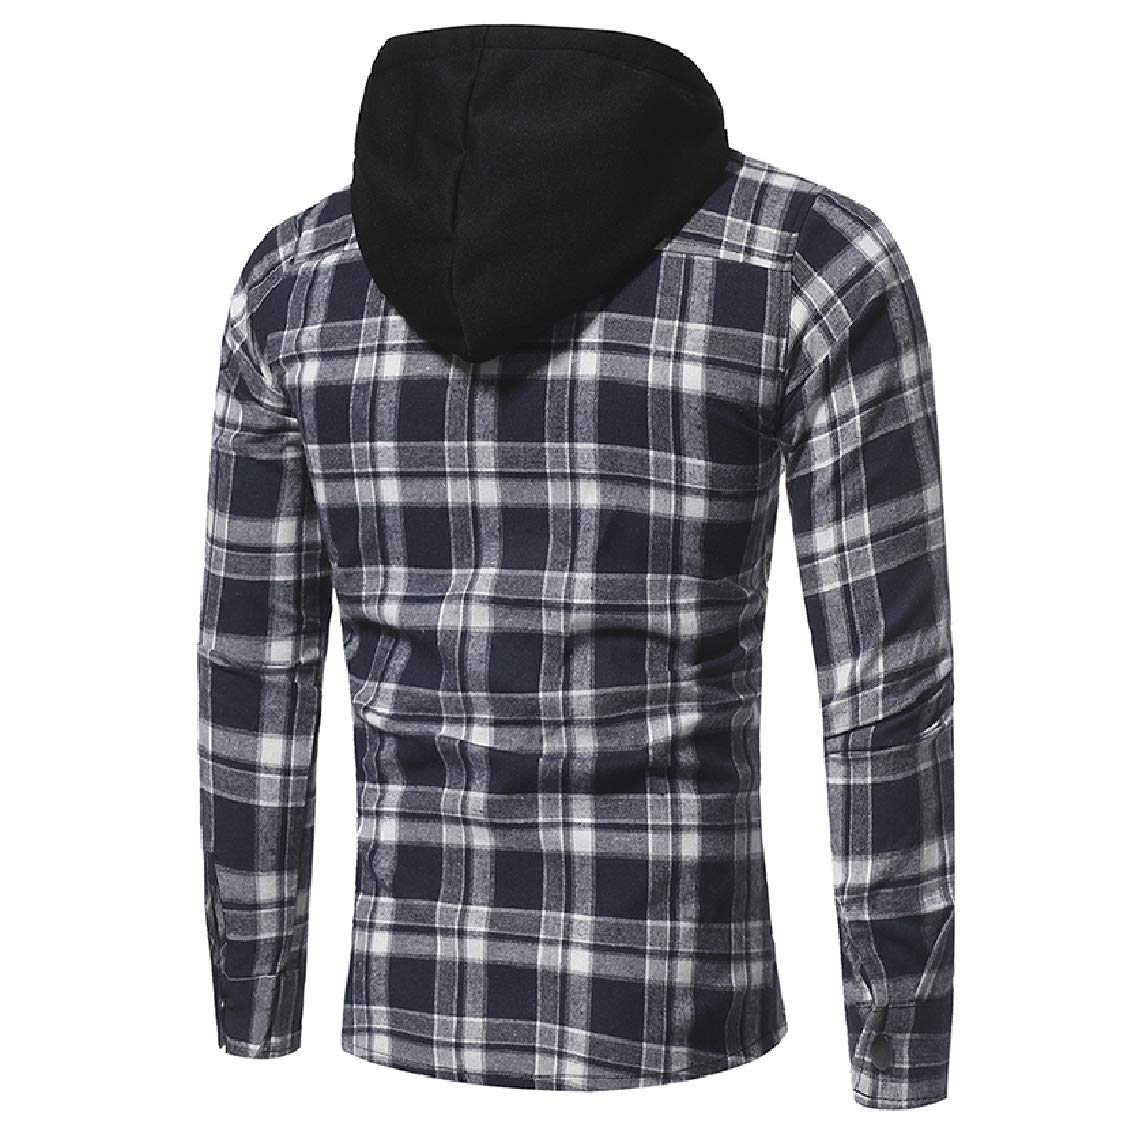 FieerMen Plaid Pocket Hood Long-Sleeved Plus Velvet Button Dress Shirt